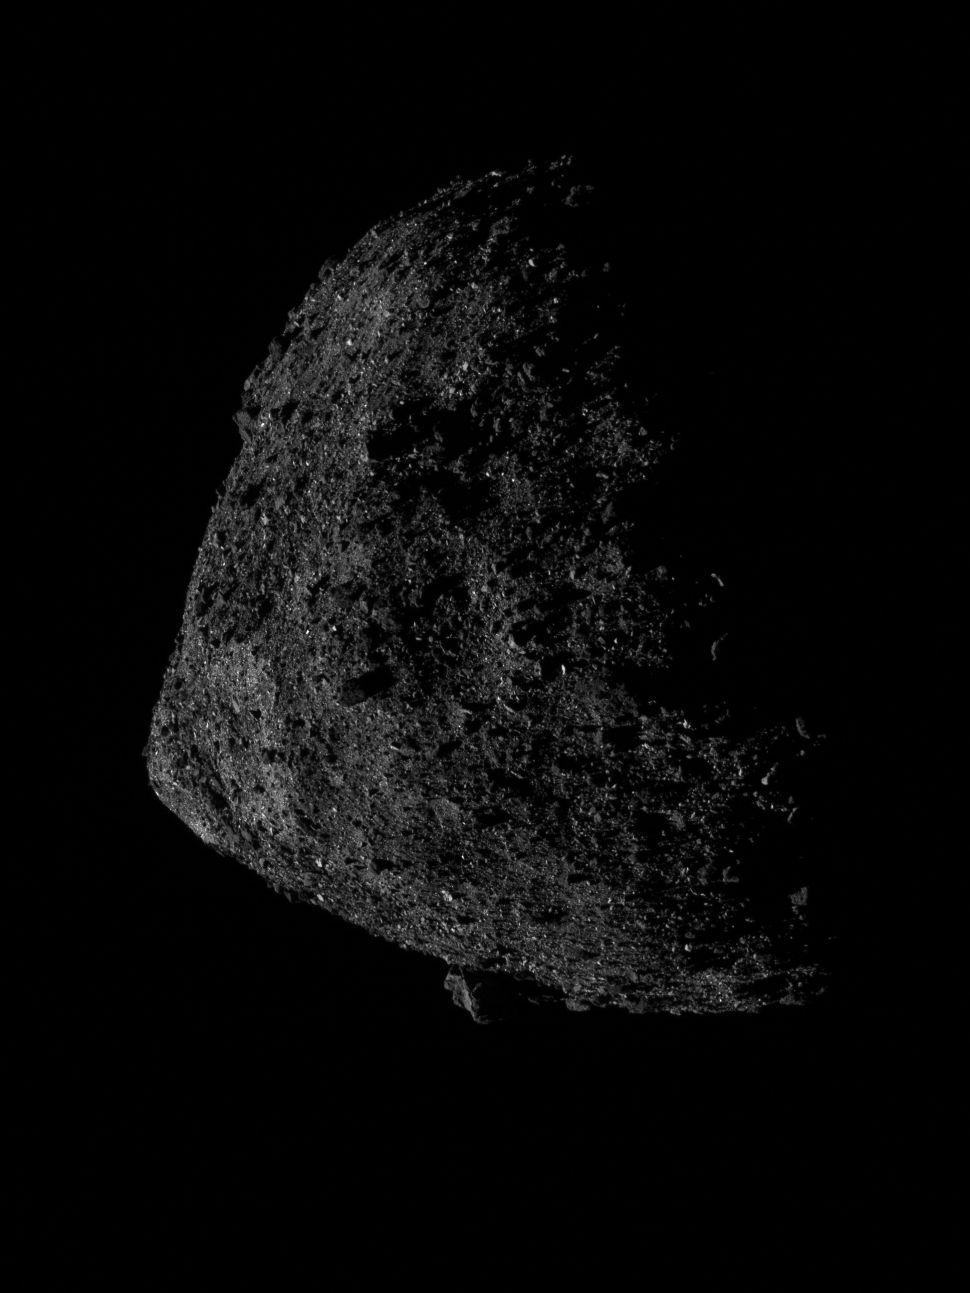 длинный астероид флоренс картинки помогают